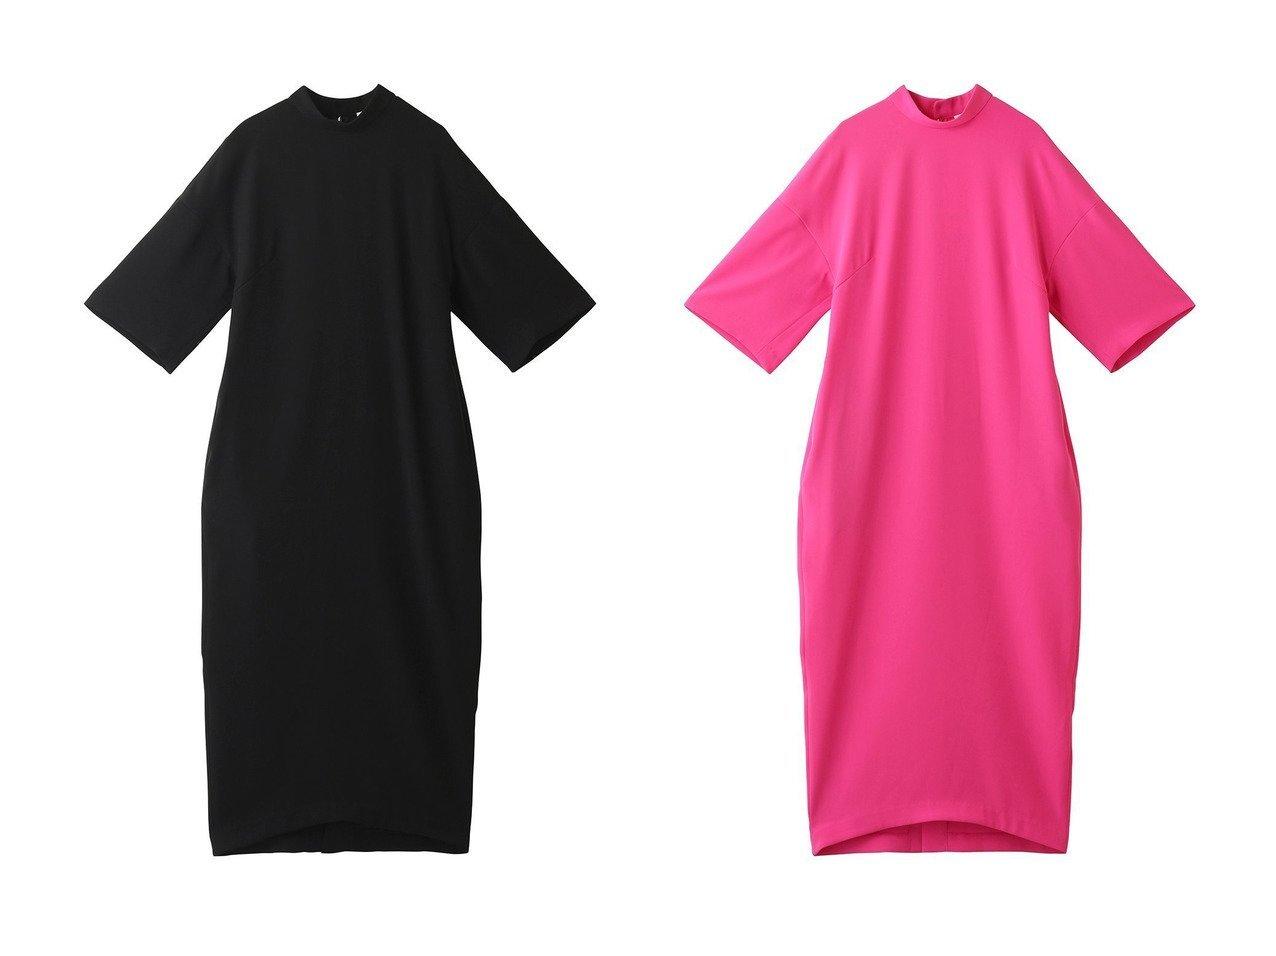 【ENFOLD/エンフォルド】のダブルサテン スタンドドレス ワンピース・ドレスのおすすめ!人気、トレンド・レディースファッションの通販 おすすめで人気の流行・トレンド、ファッションの通販商品 メンズファッション・キッズファッション・インテリア・家具・レディースファッション・服の通販 founy(ファニー) https://founy.com/ ファッション Fashion レディースファッション WOMEN ワンピース Dress ドレス Party Dresses 2021年 2021 2021 春夏 S/S SS Spring/Summer 2021 S/S 春夏 SS Spring/Summer サテン スタンド ダブル ドレス ロング 定番 Standard 春 Spring |ID:crp329100000023385